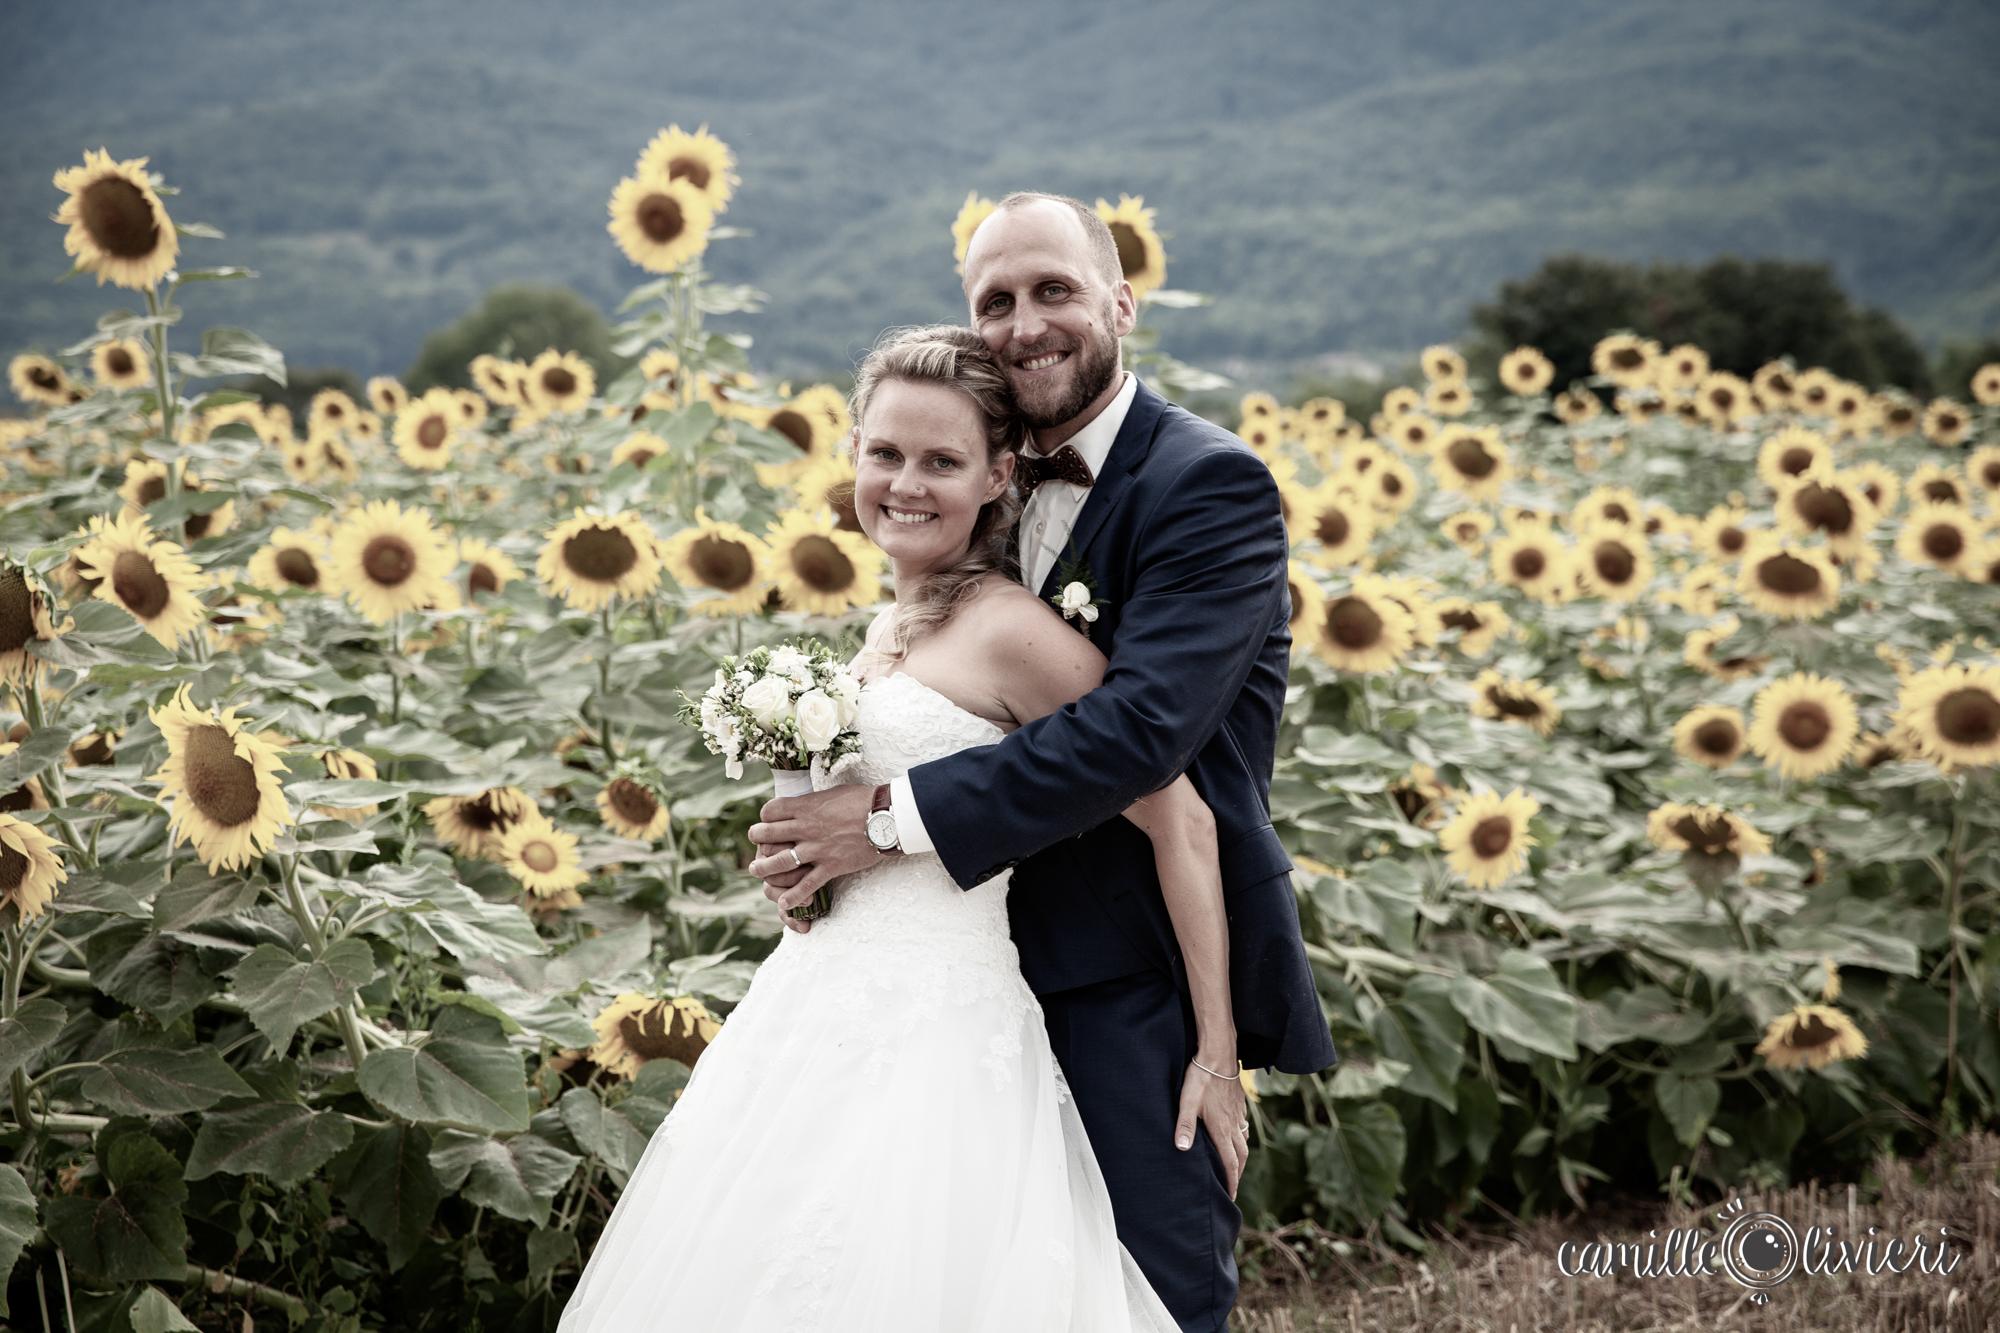 photographe_grenoble_mariage-camille-olivieri-121